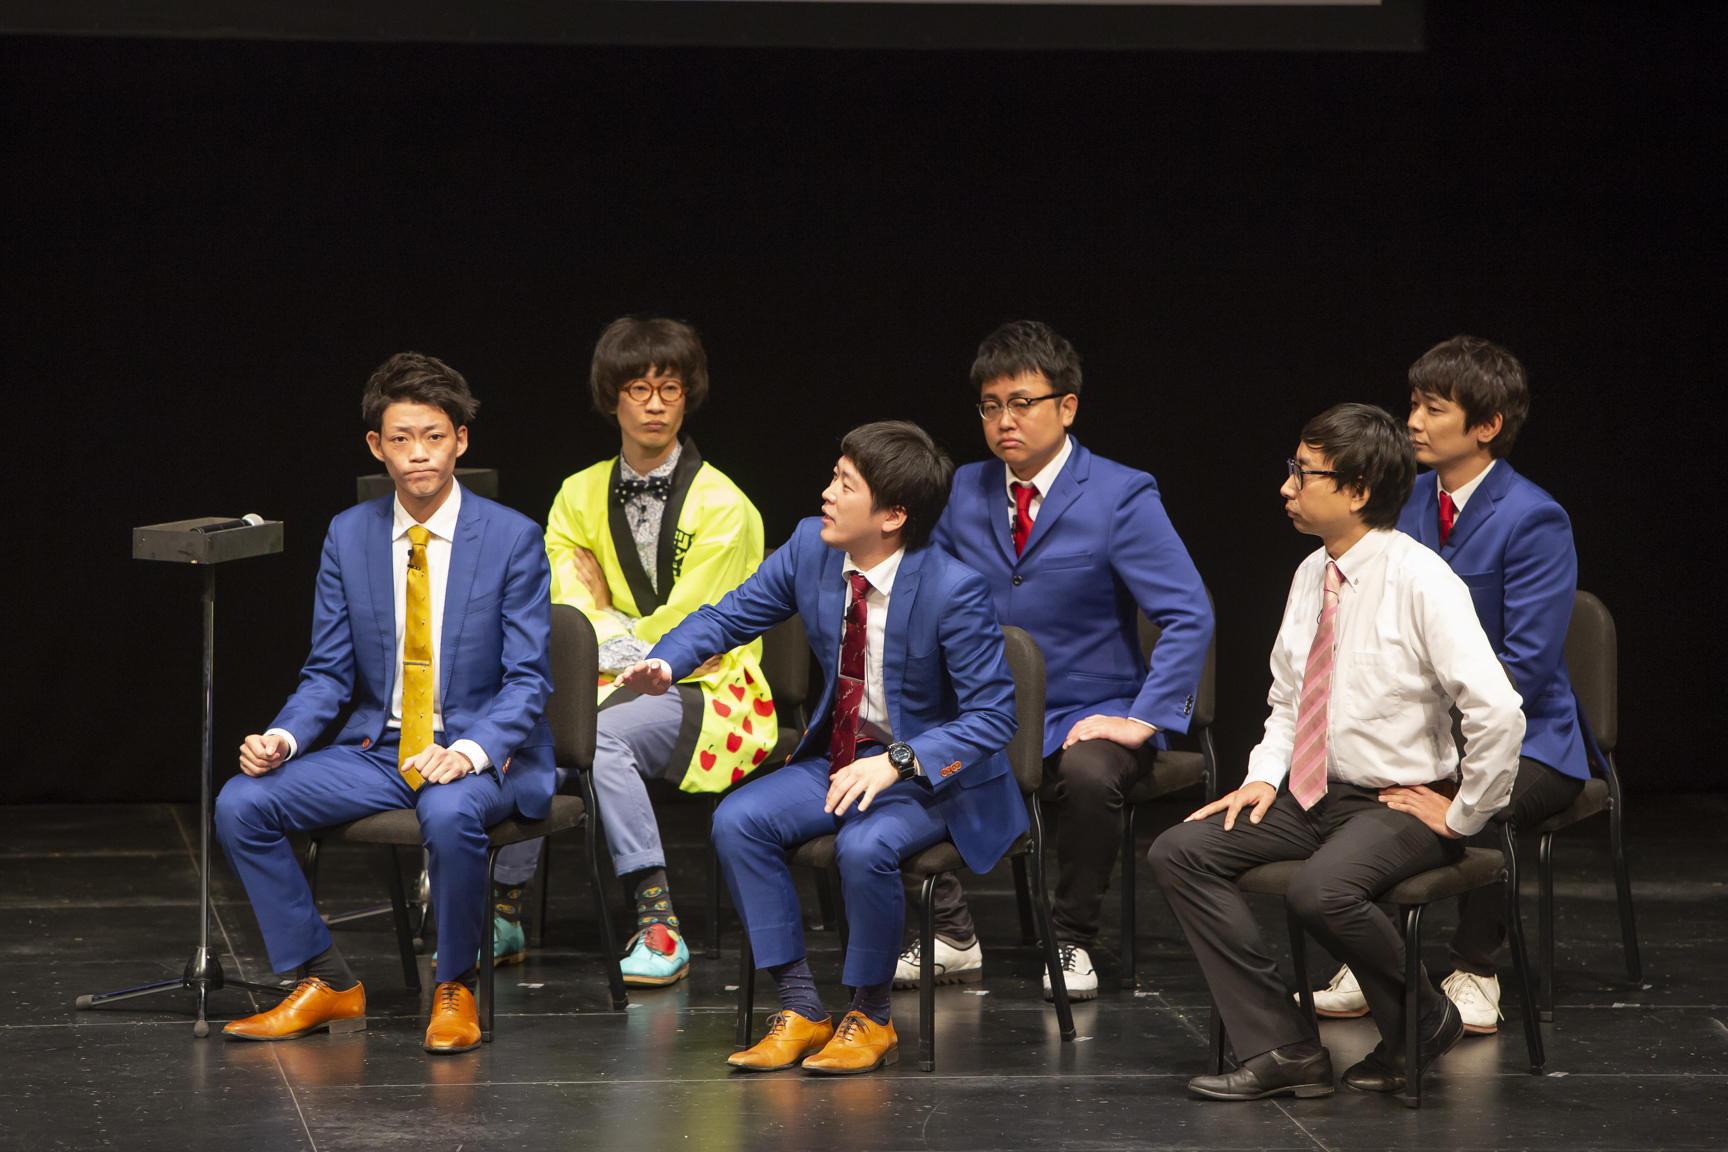 http://news.yoshimoto.co.jp/20190129121932-87d5c6263415695bb99f75aba730f7f5002257b6.jpg